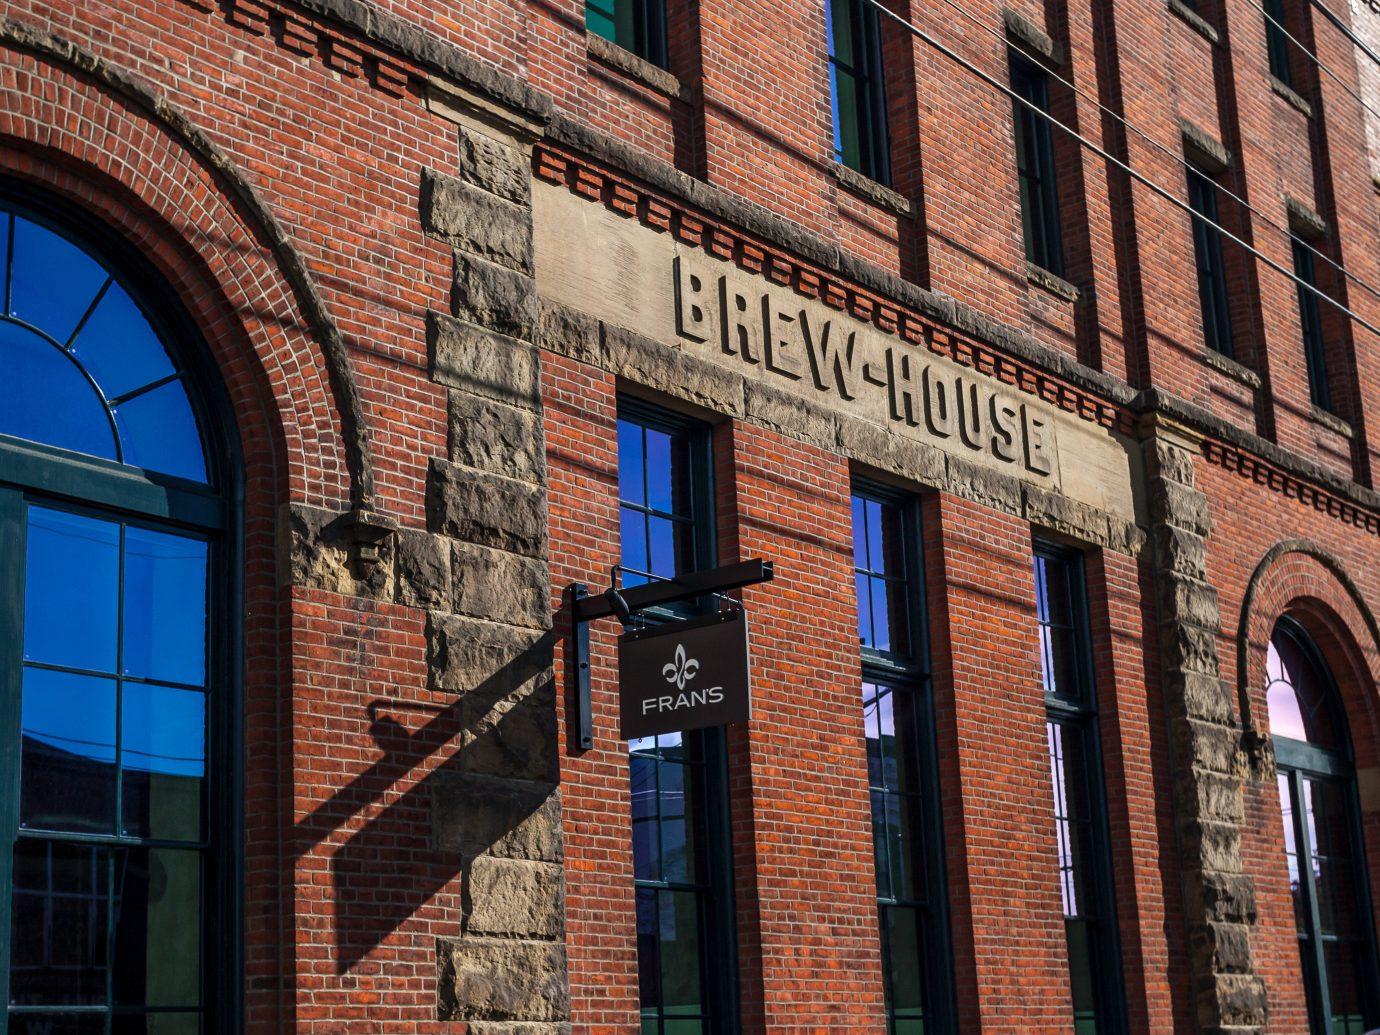 Food + Drink building brick outdoor Town City landmark urban area neighbourhood road Architecture human settlement wall Downtown facade street tall window synagogue